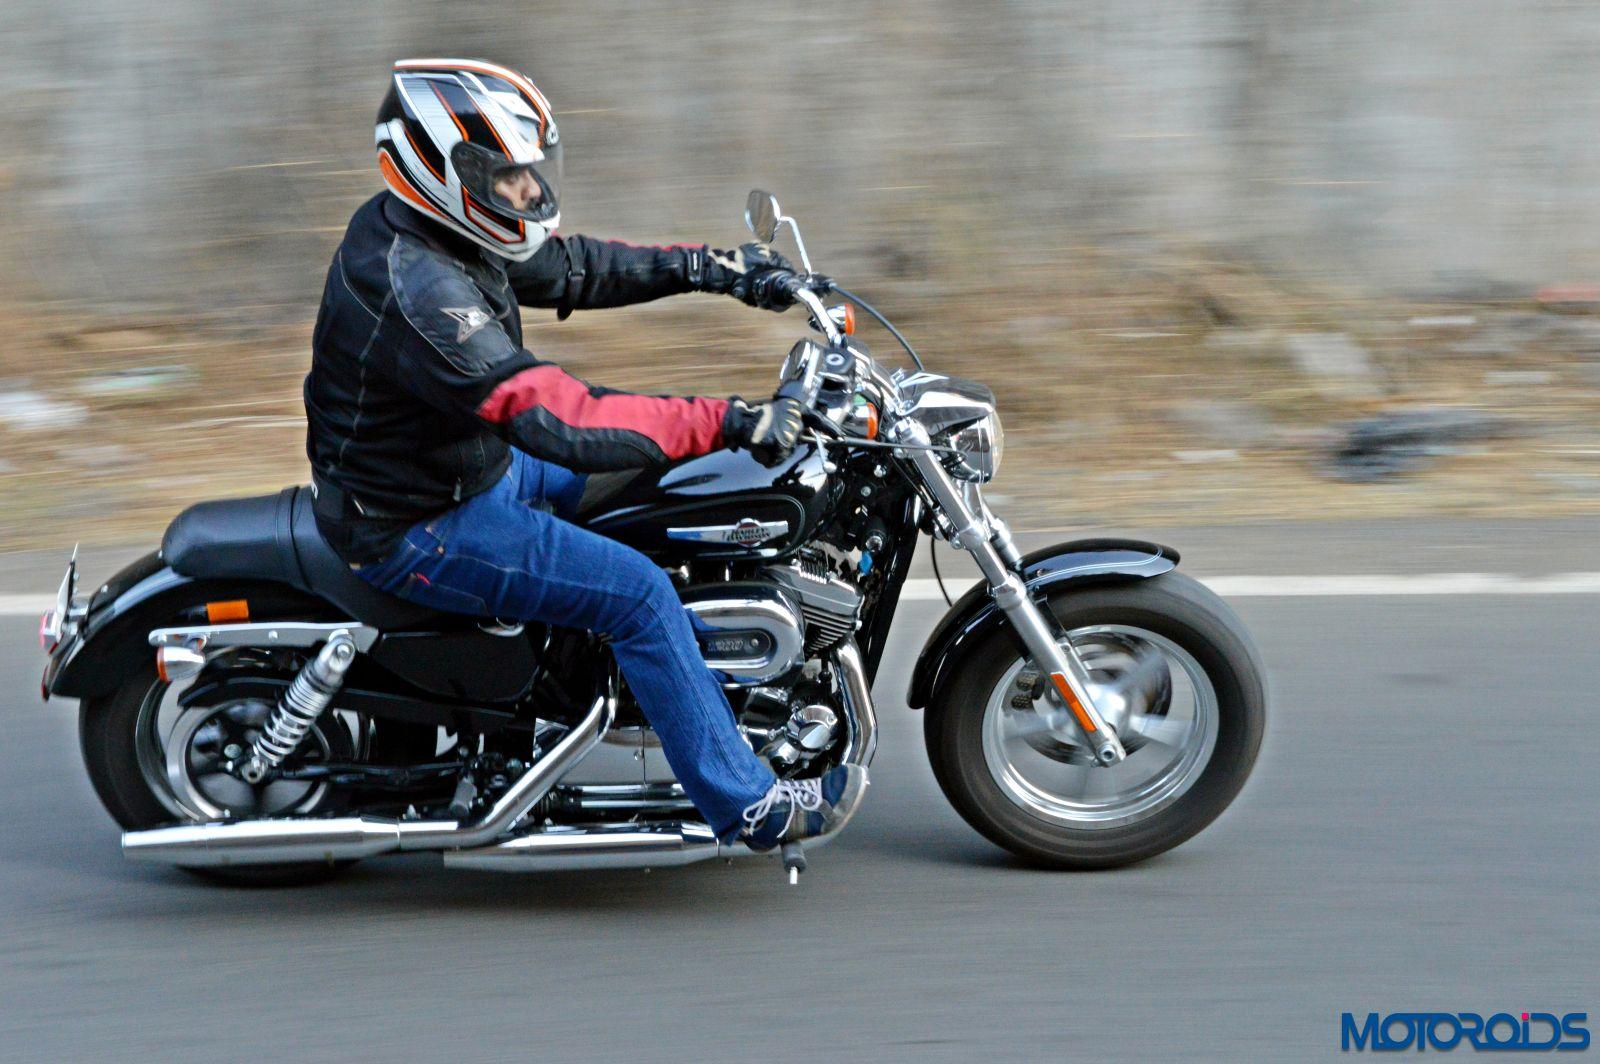 Harley Davidson 1200 Custom Review Action Shots 3